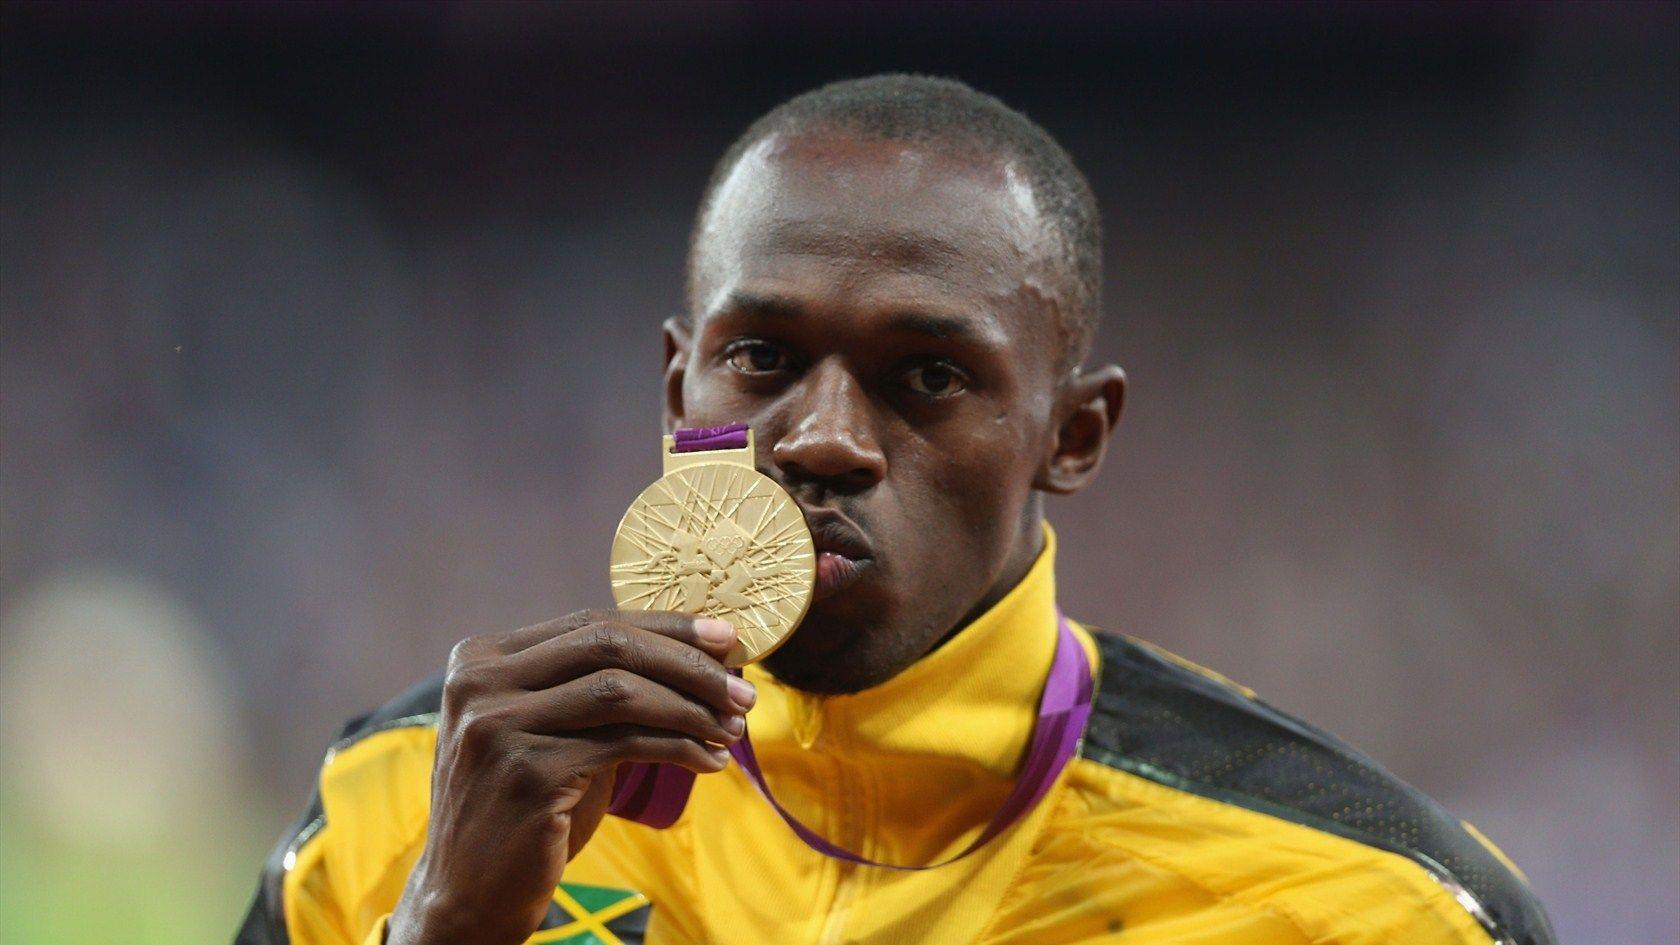 Usain Bolt Atletic Wallpaper | ardiwallpaper.